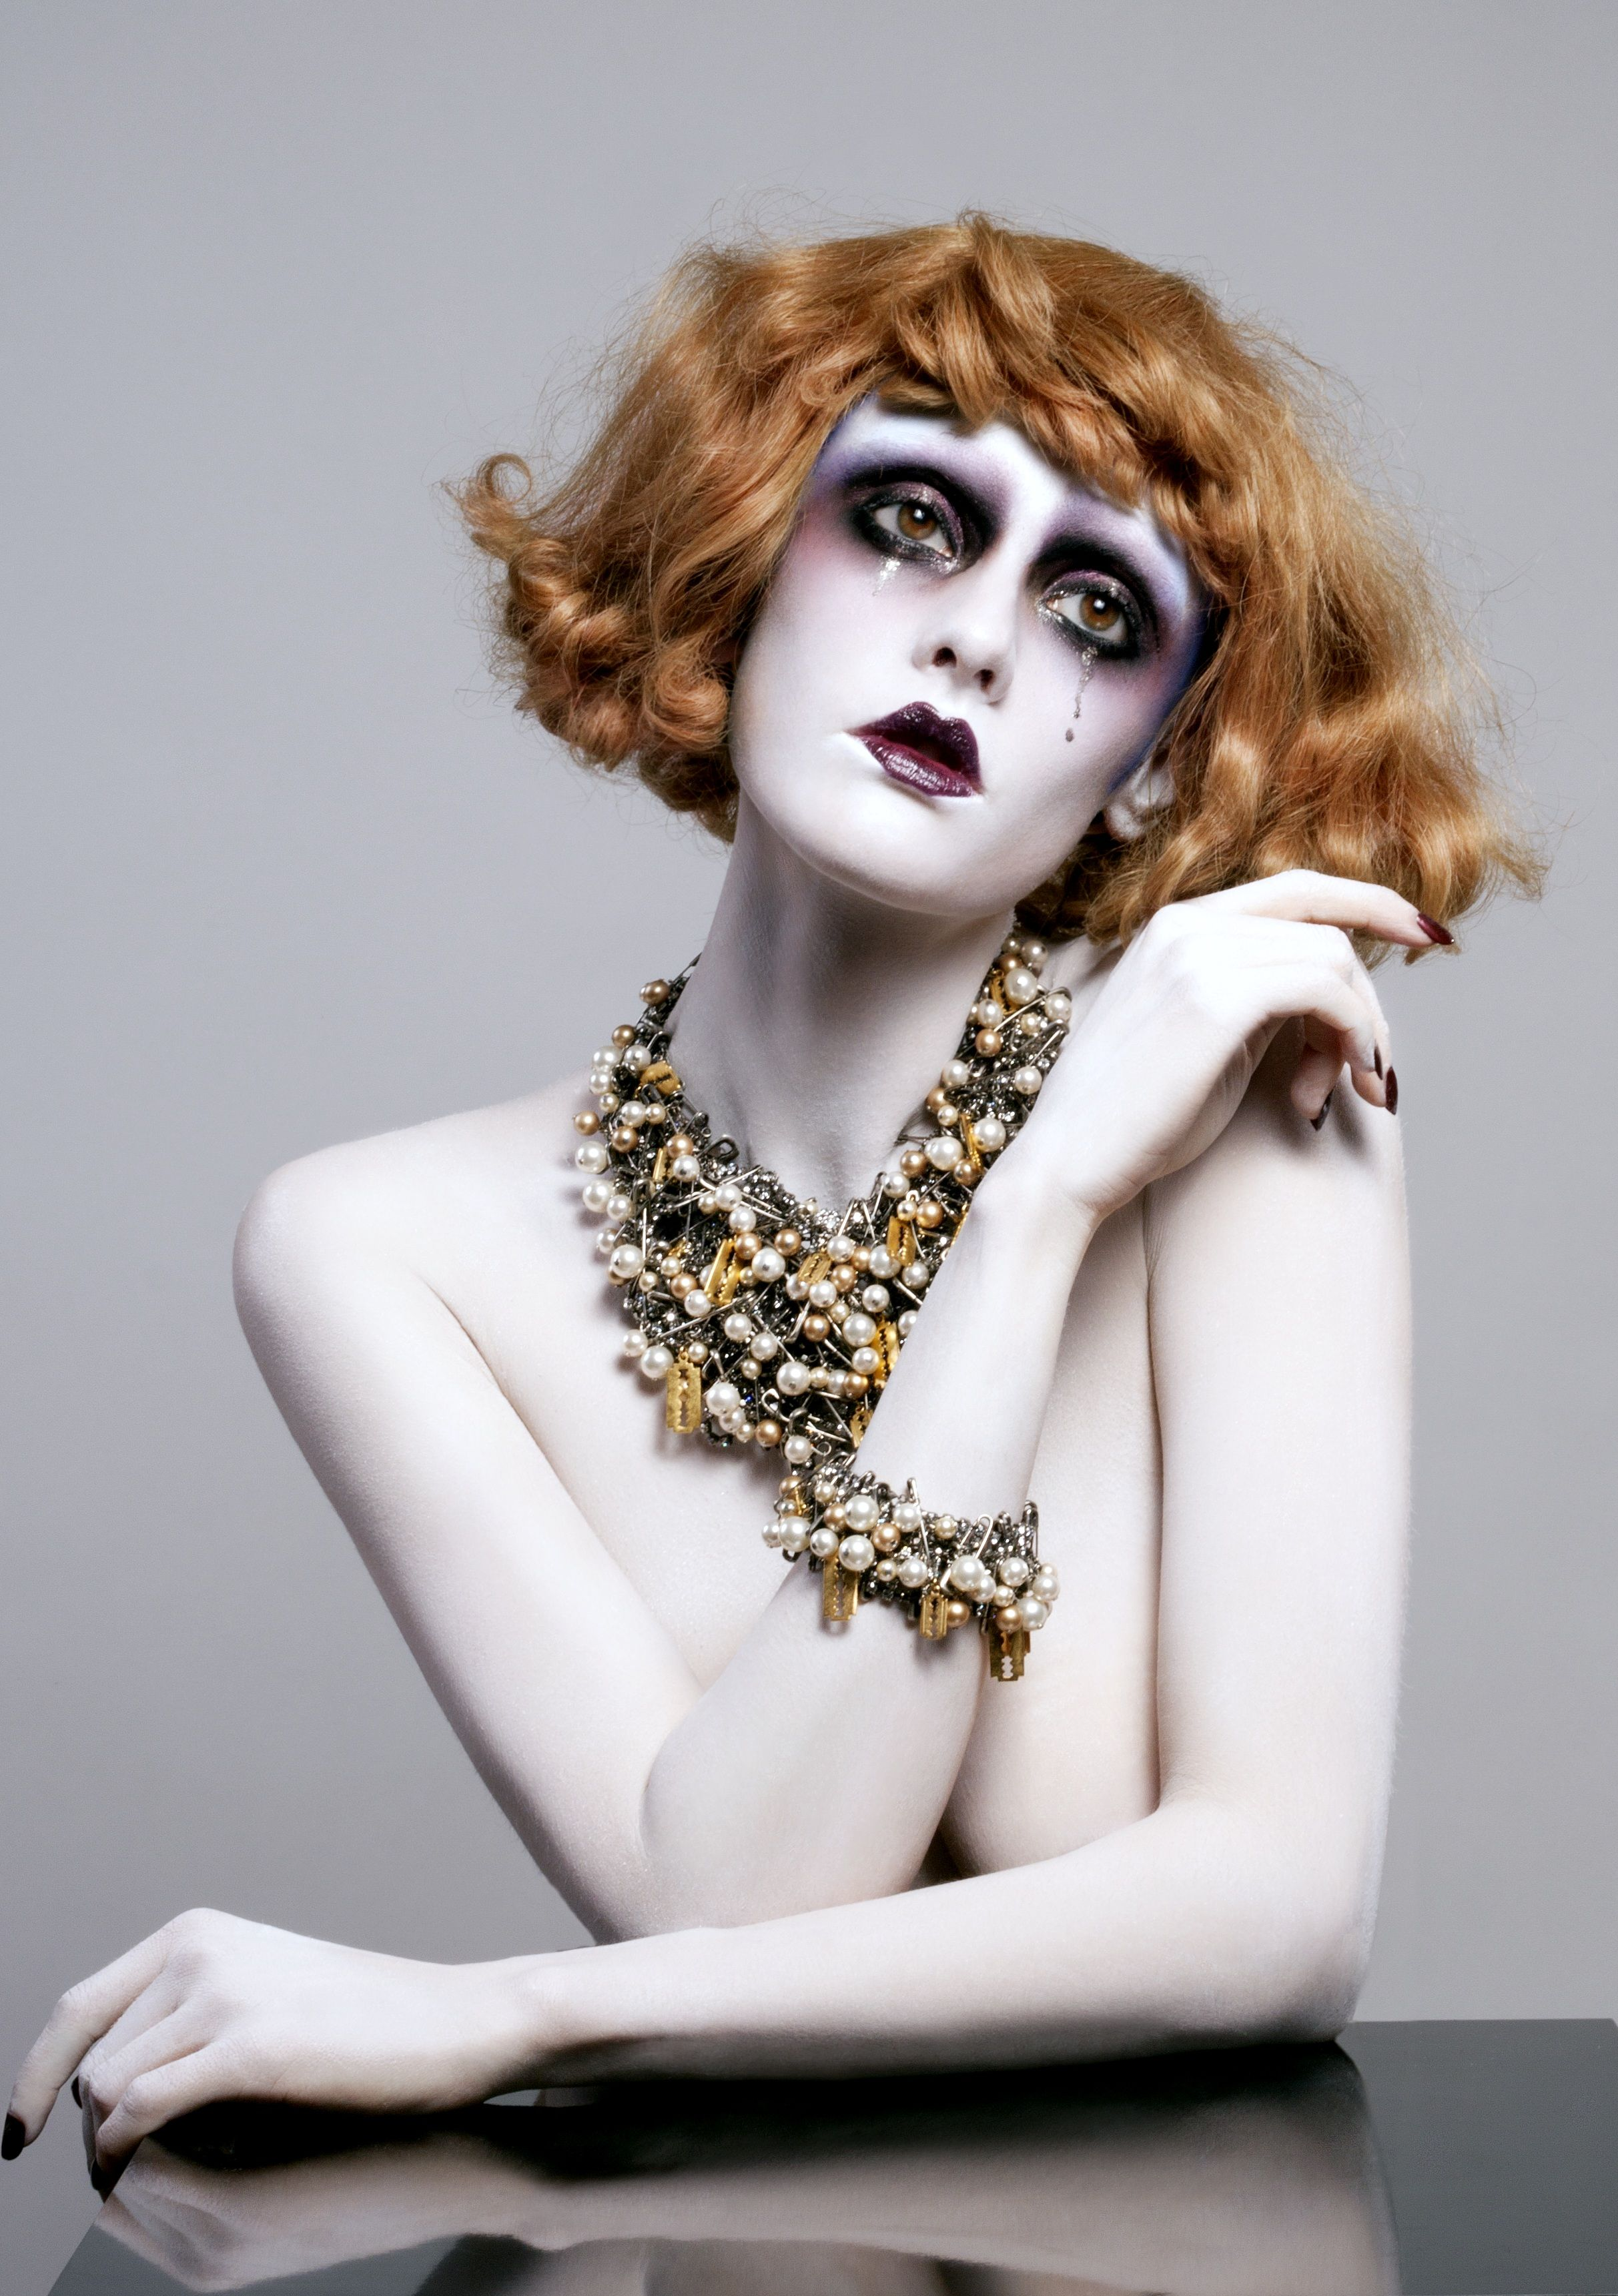 Photo Oriana Layendecker Makeup Roshar Model Jennifer